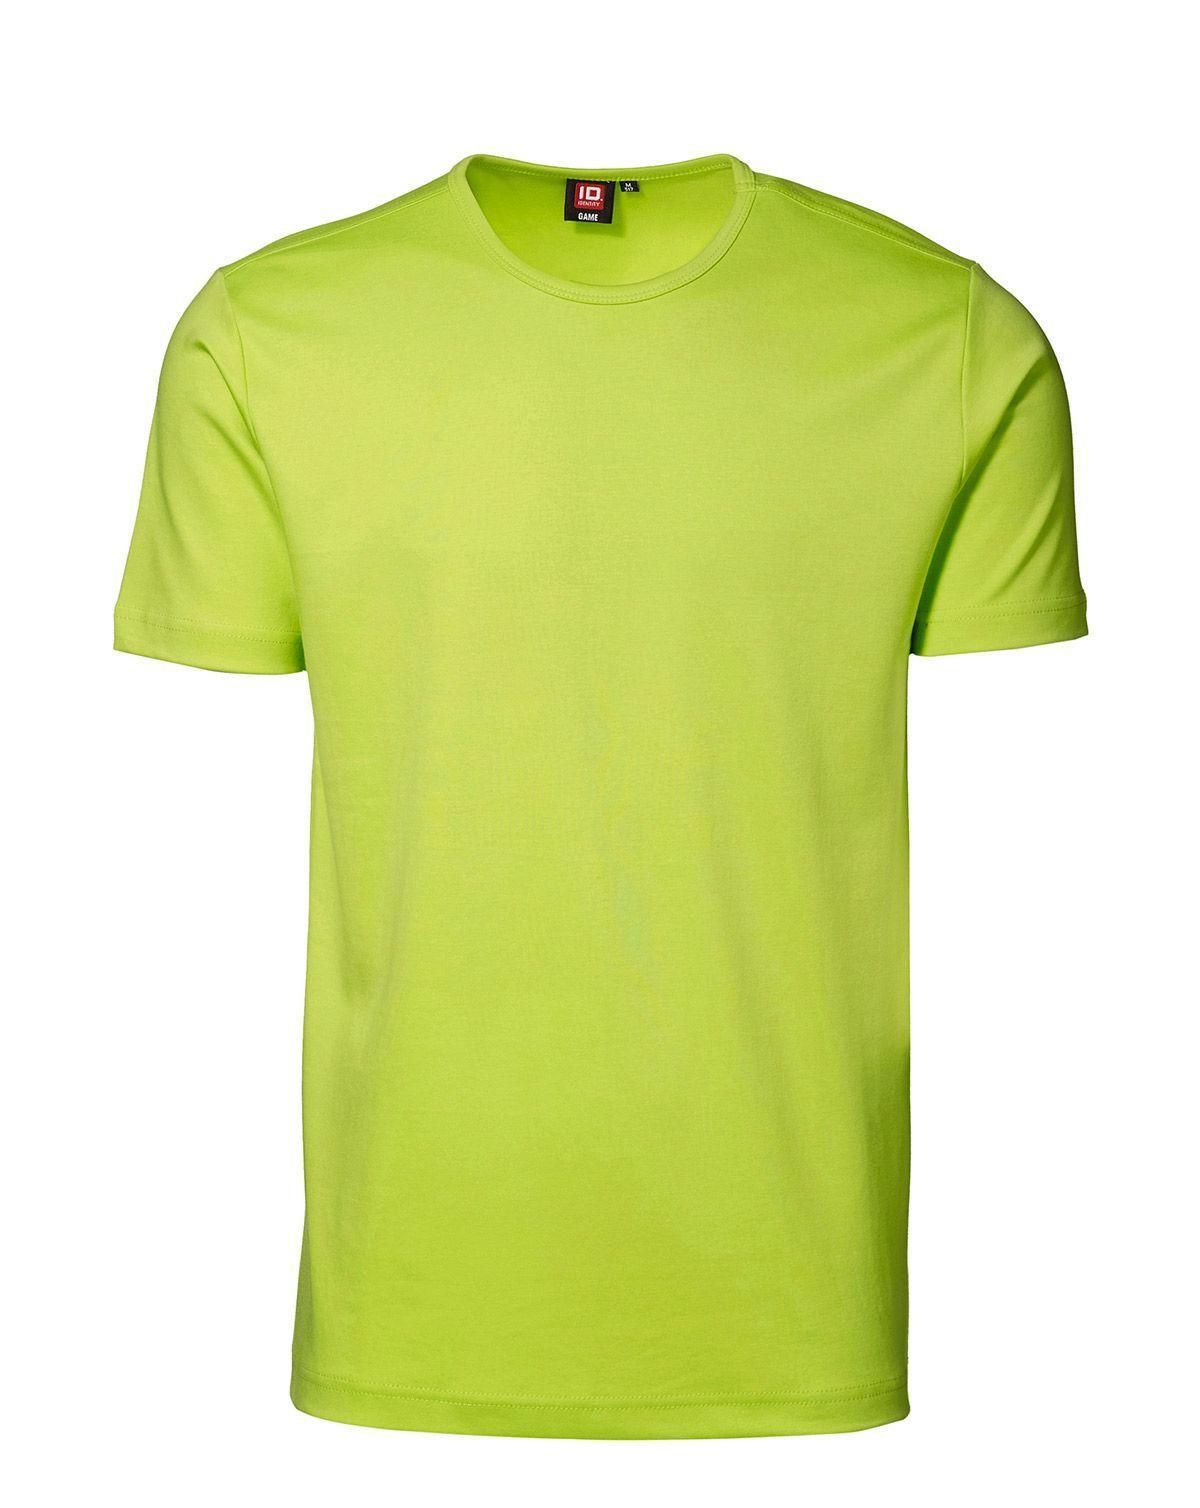 ID Interlock T-shirt (Lime, XL)